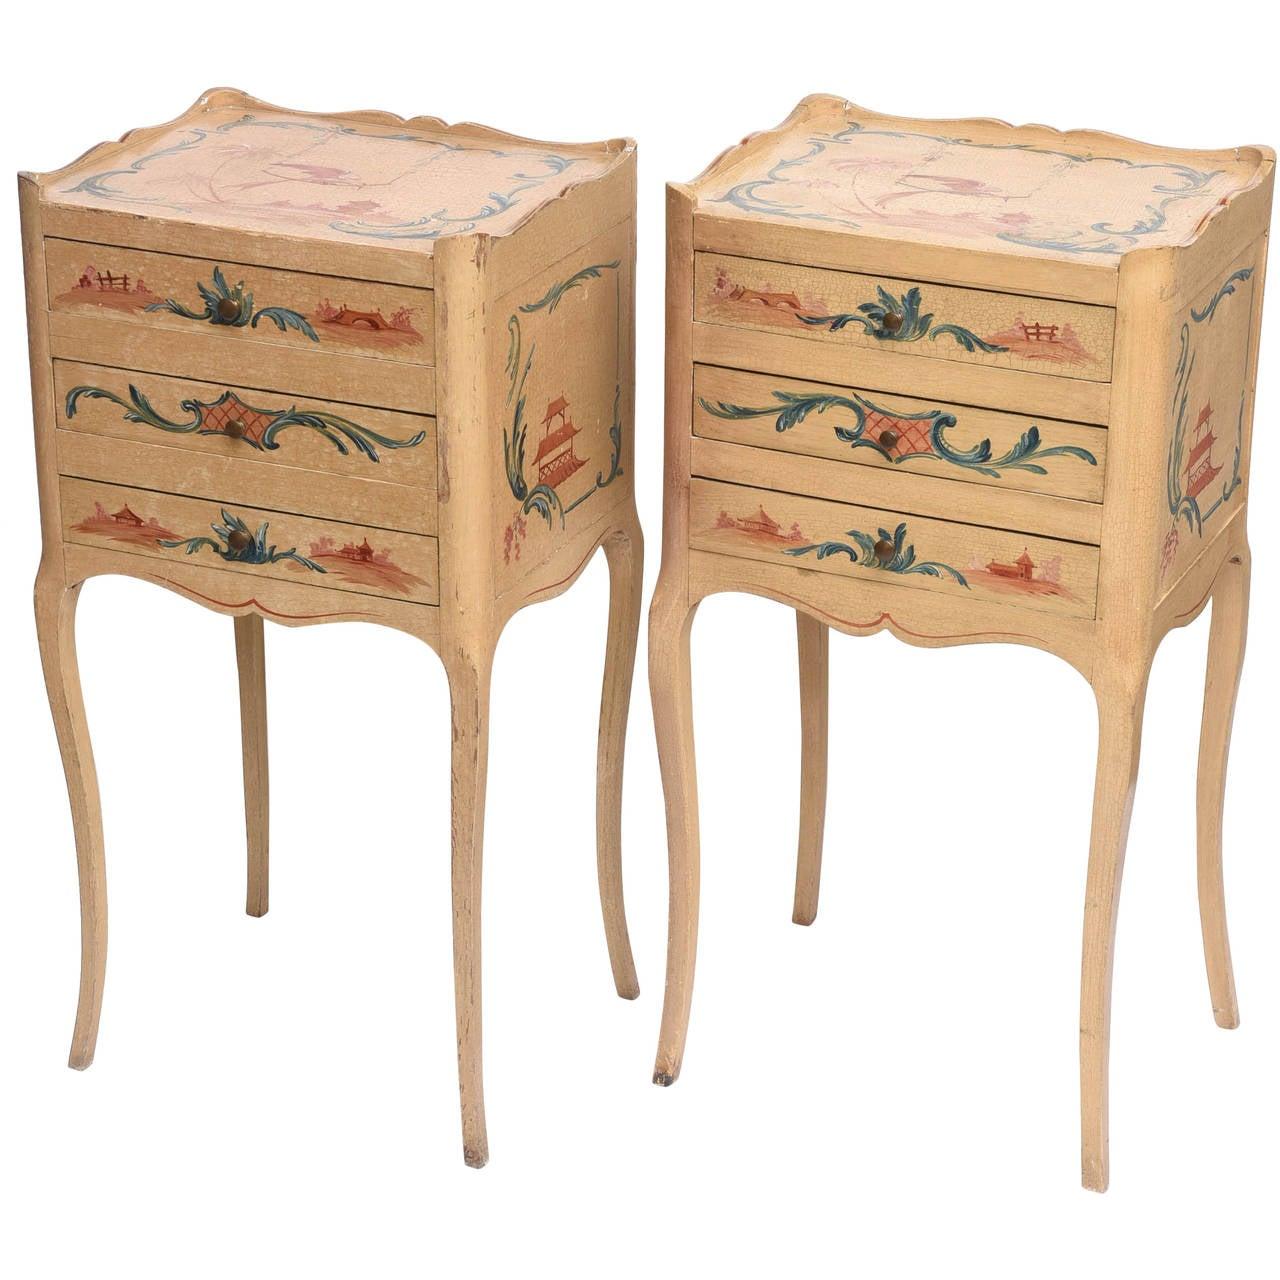 Pair of Vintage Chinoiserie Nightstands